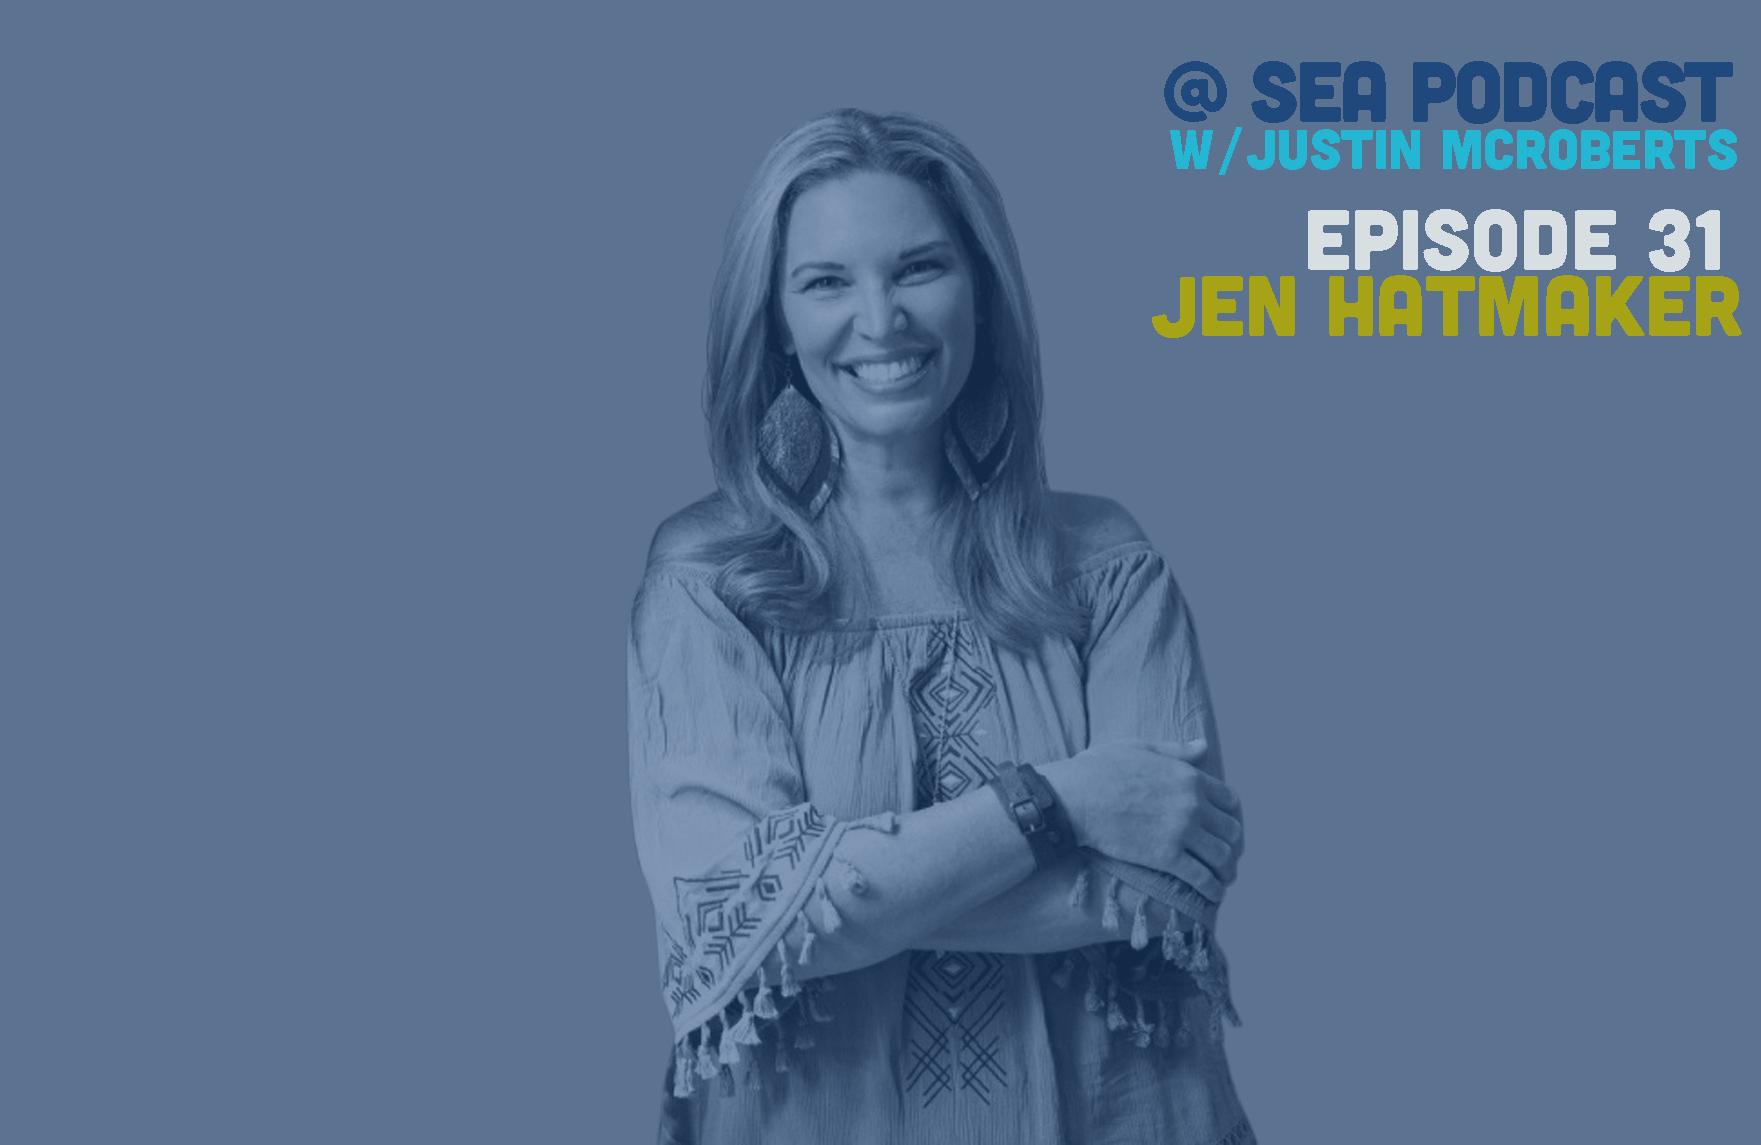 @ Sea Podcast 31: Jen Hatmaker